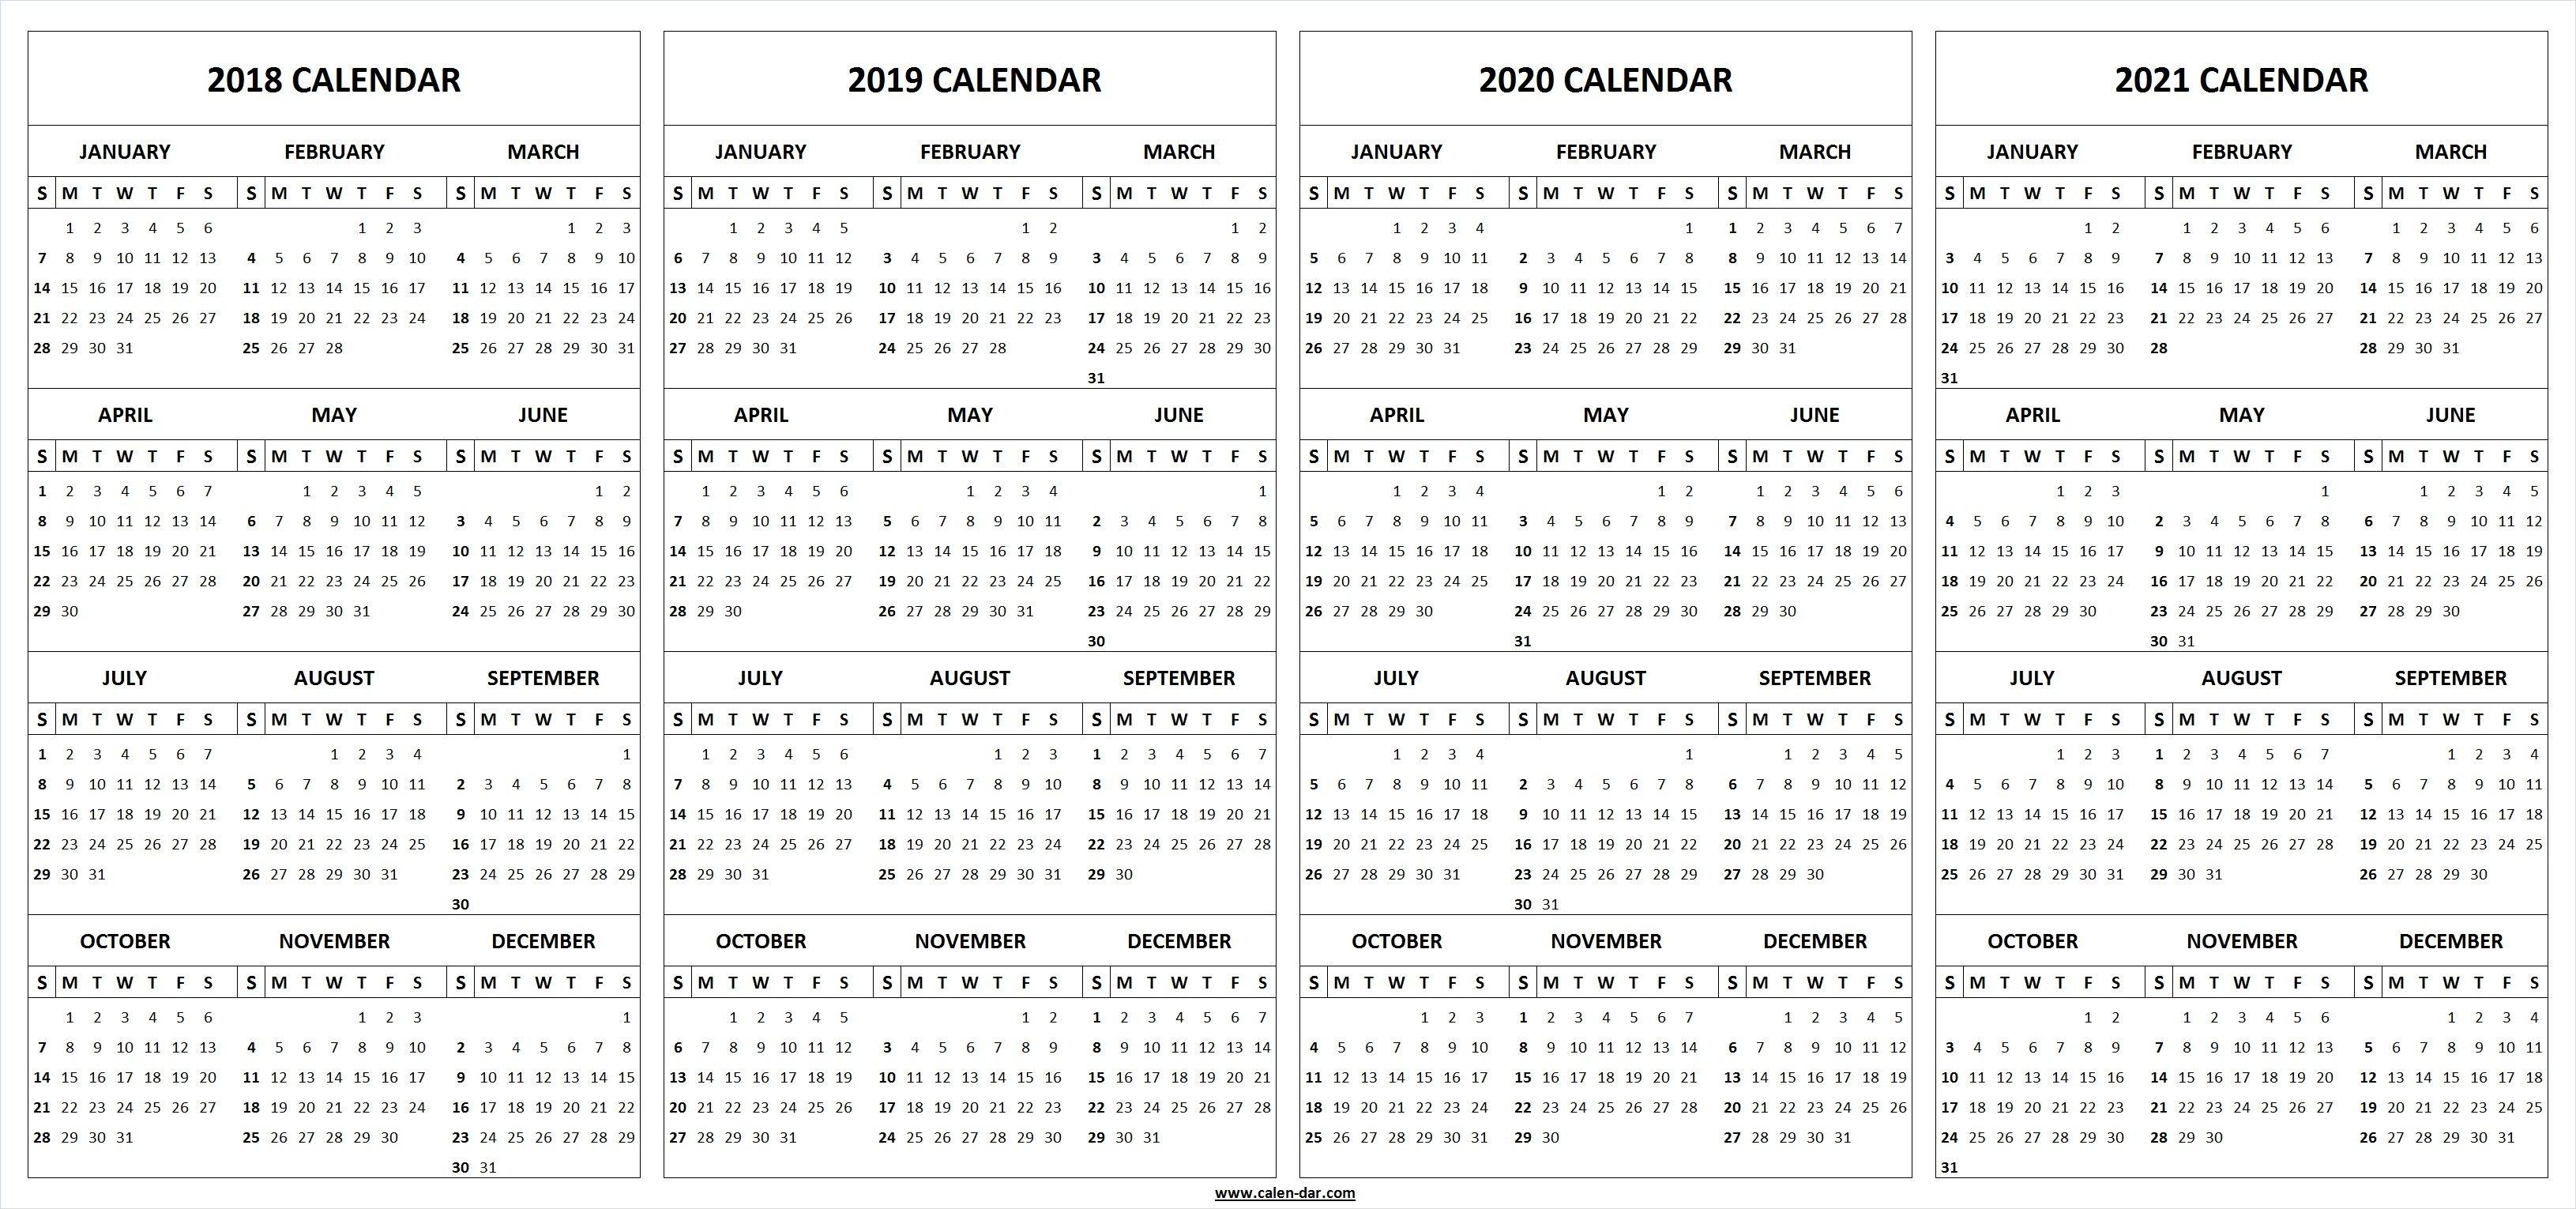 4 Four Year 2018 2019 2020 2021 Calendar Printable Template for 3 Year Calendar Printable 2018 2019 2020